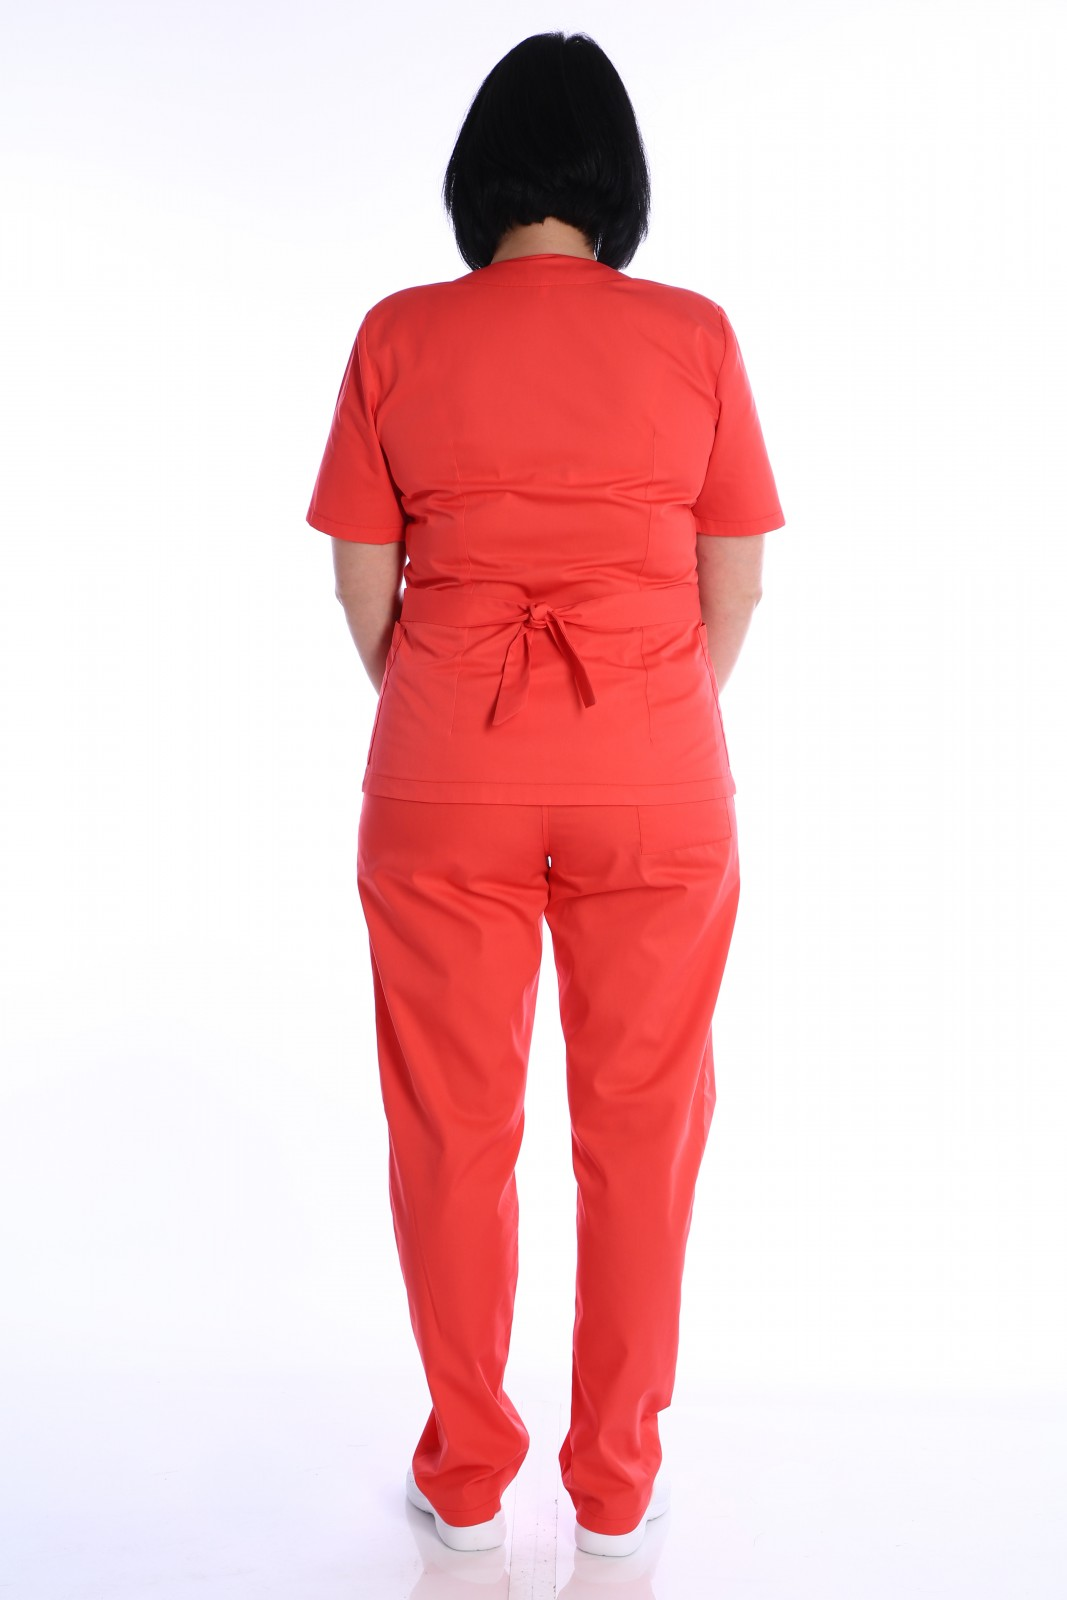 uniforma medicala corai